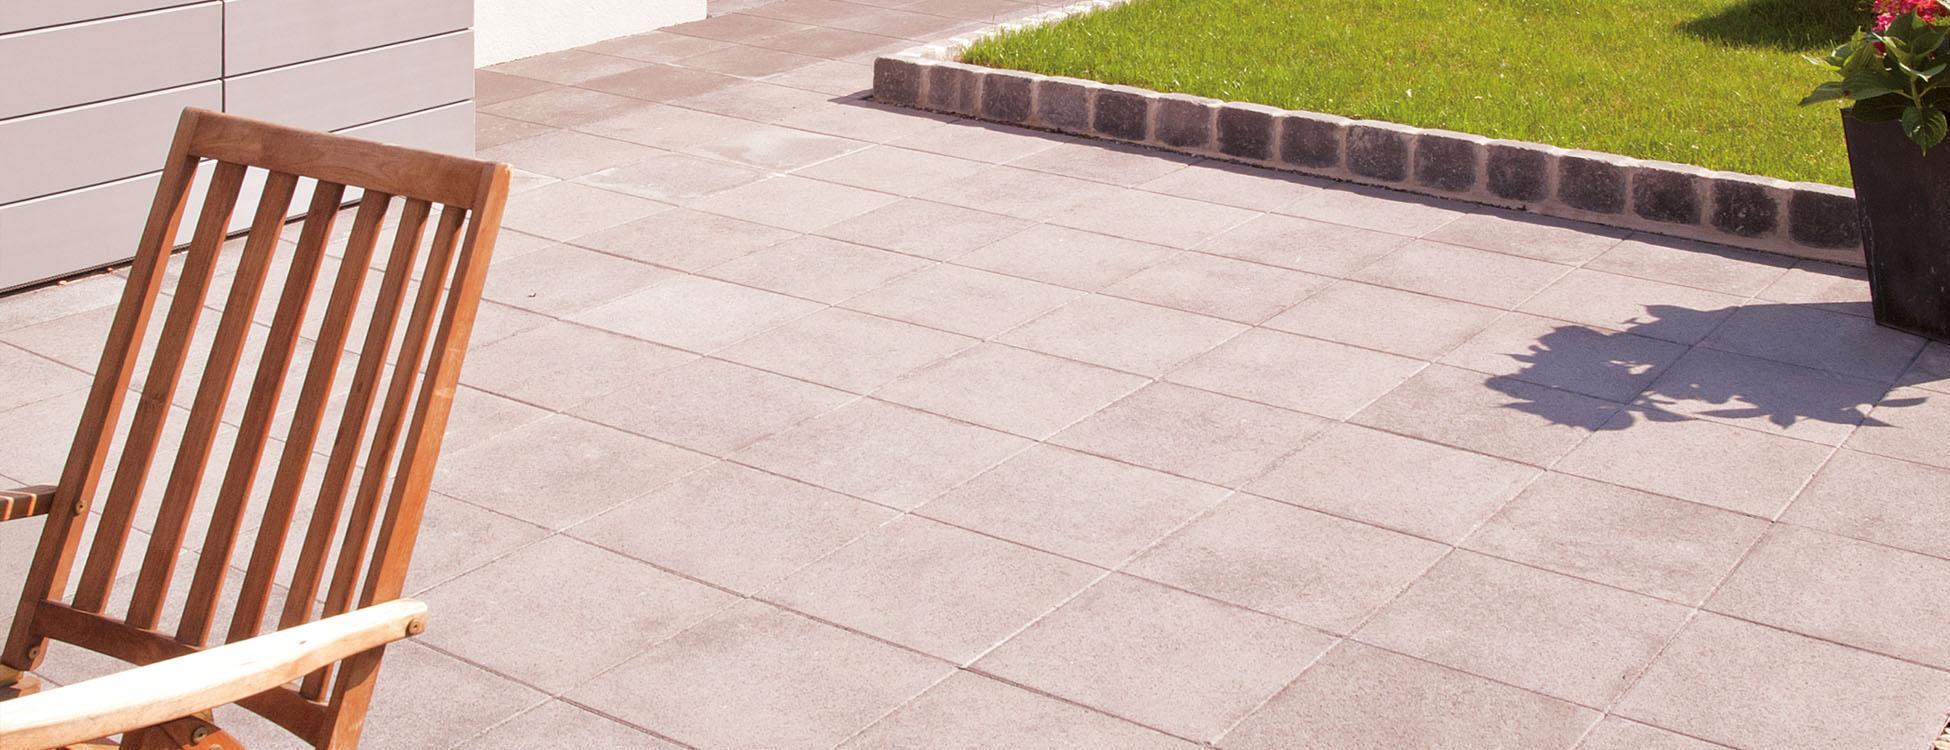 gehwegplatten | lintel-gruppe